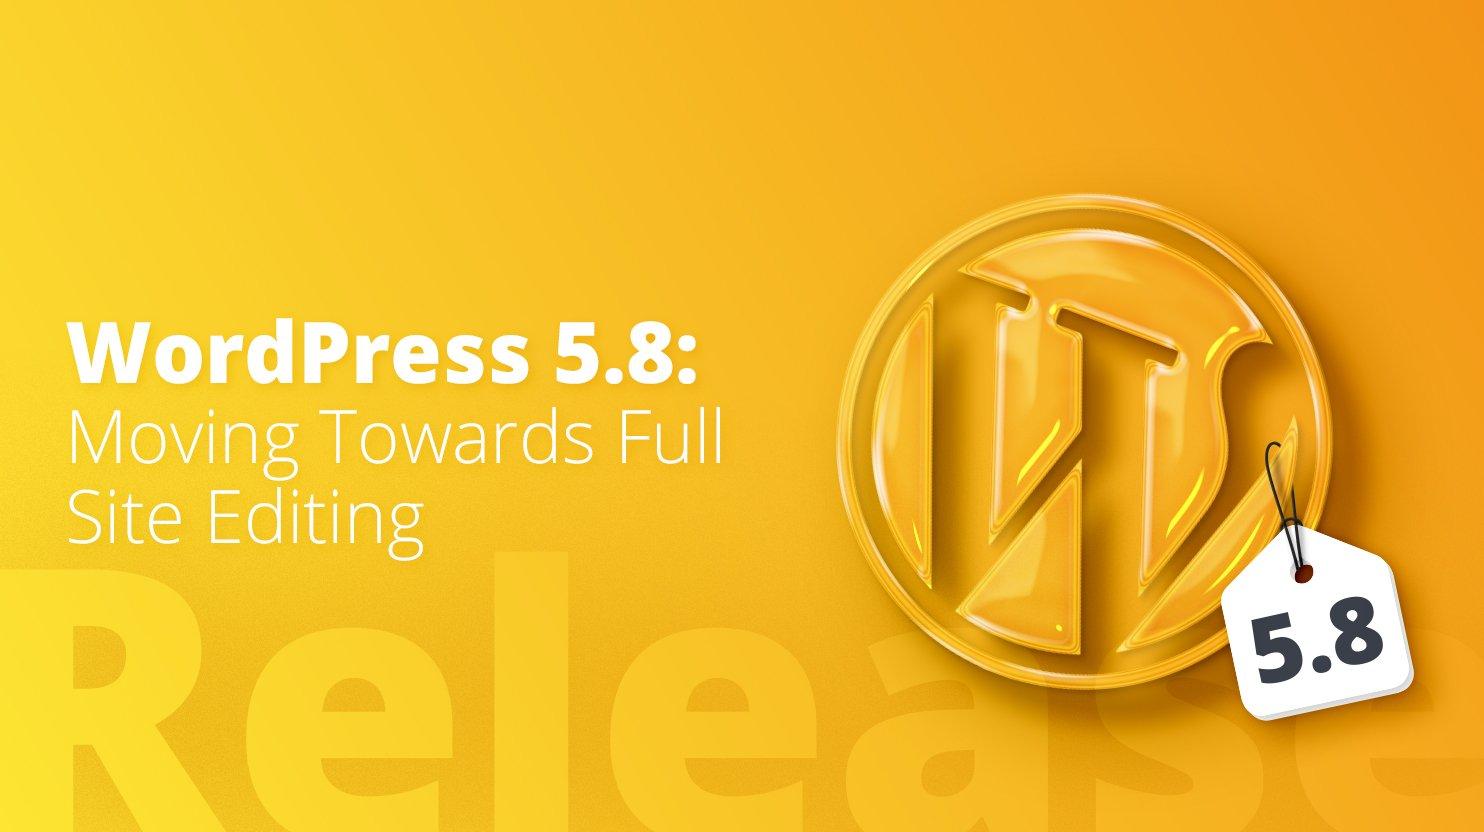 WordPress 5.8: Moving Towards Full Site Editing